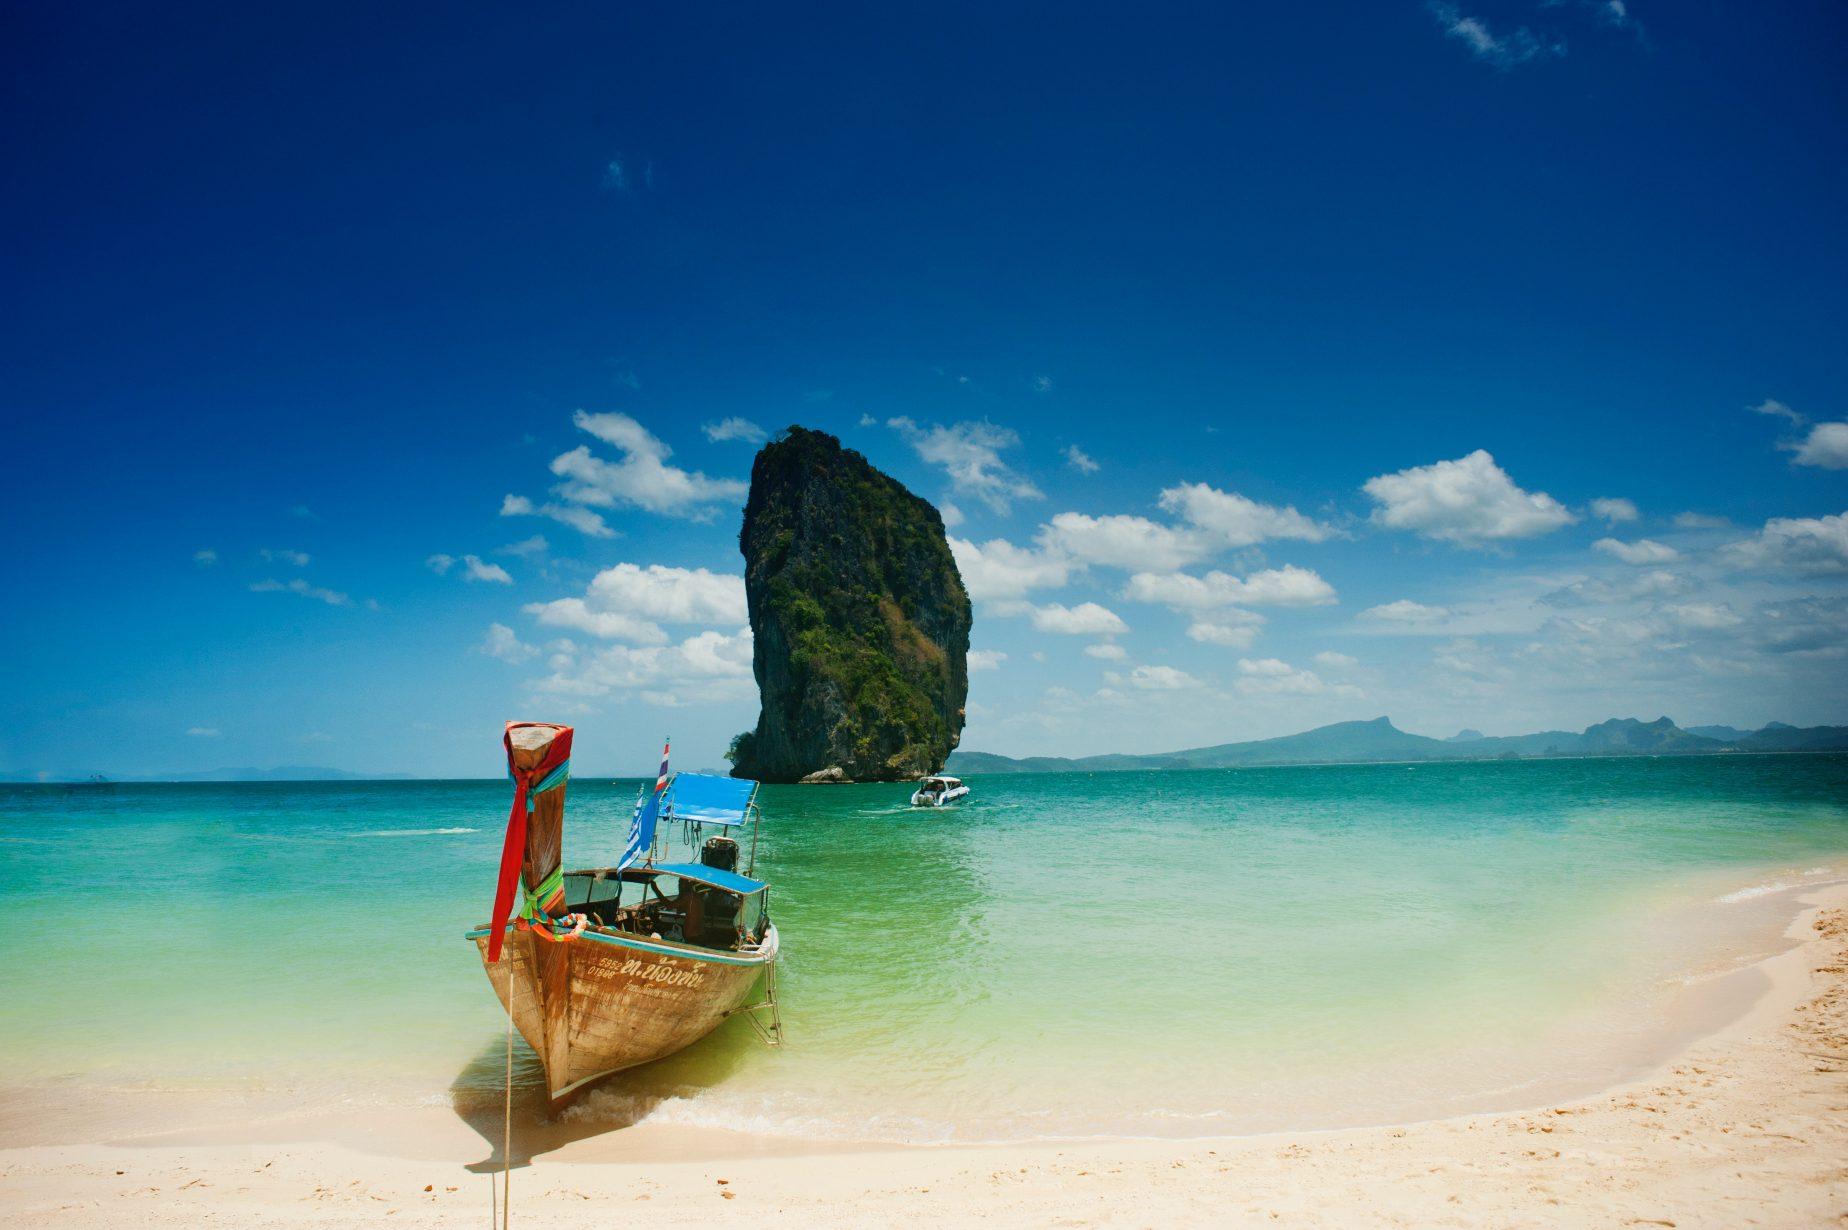 background-beach-blue-sky-1007657